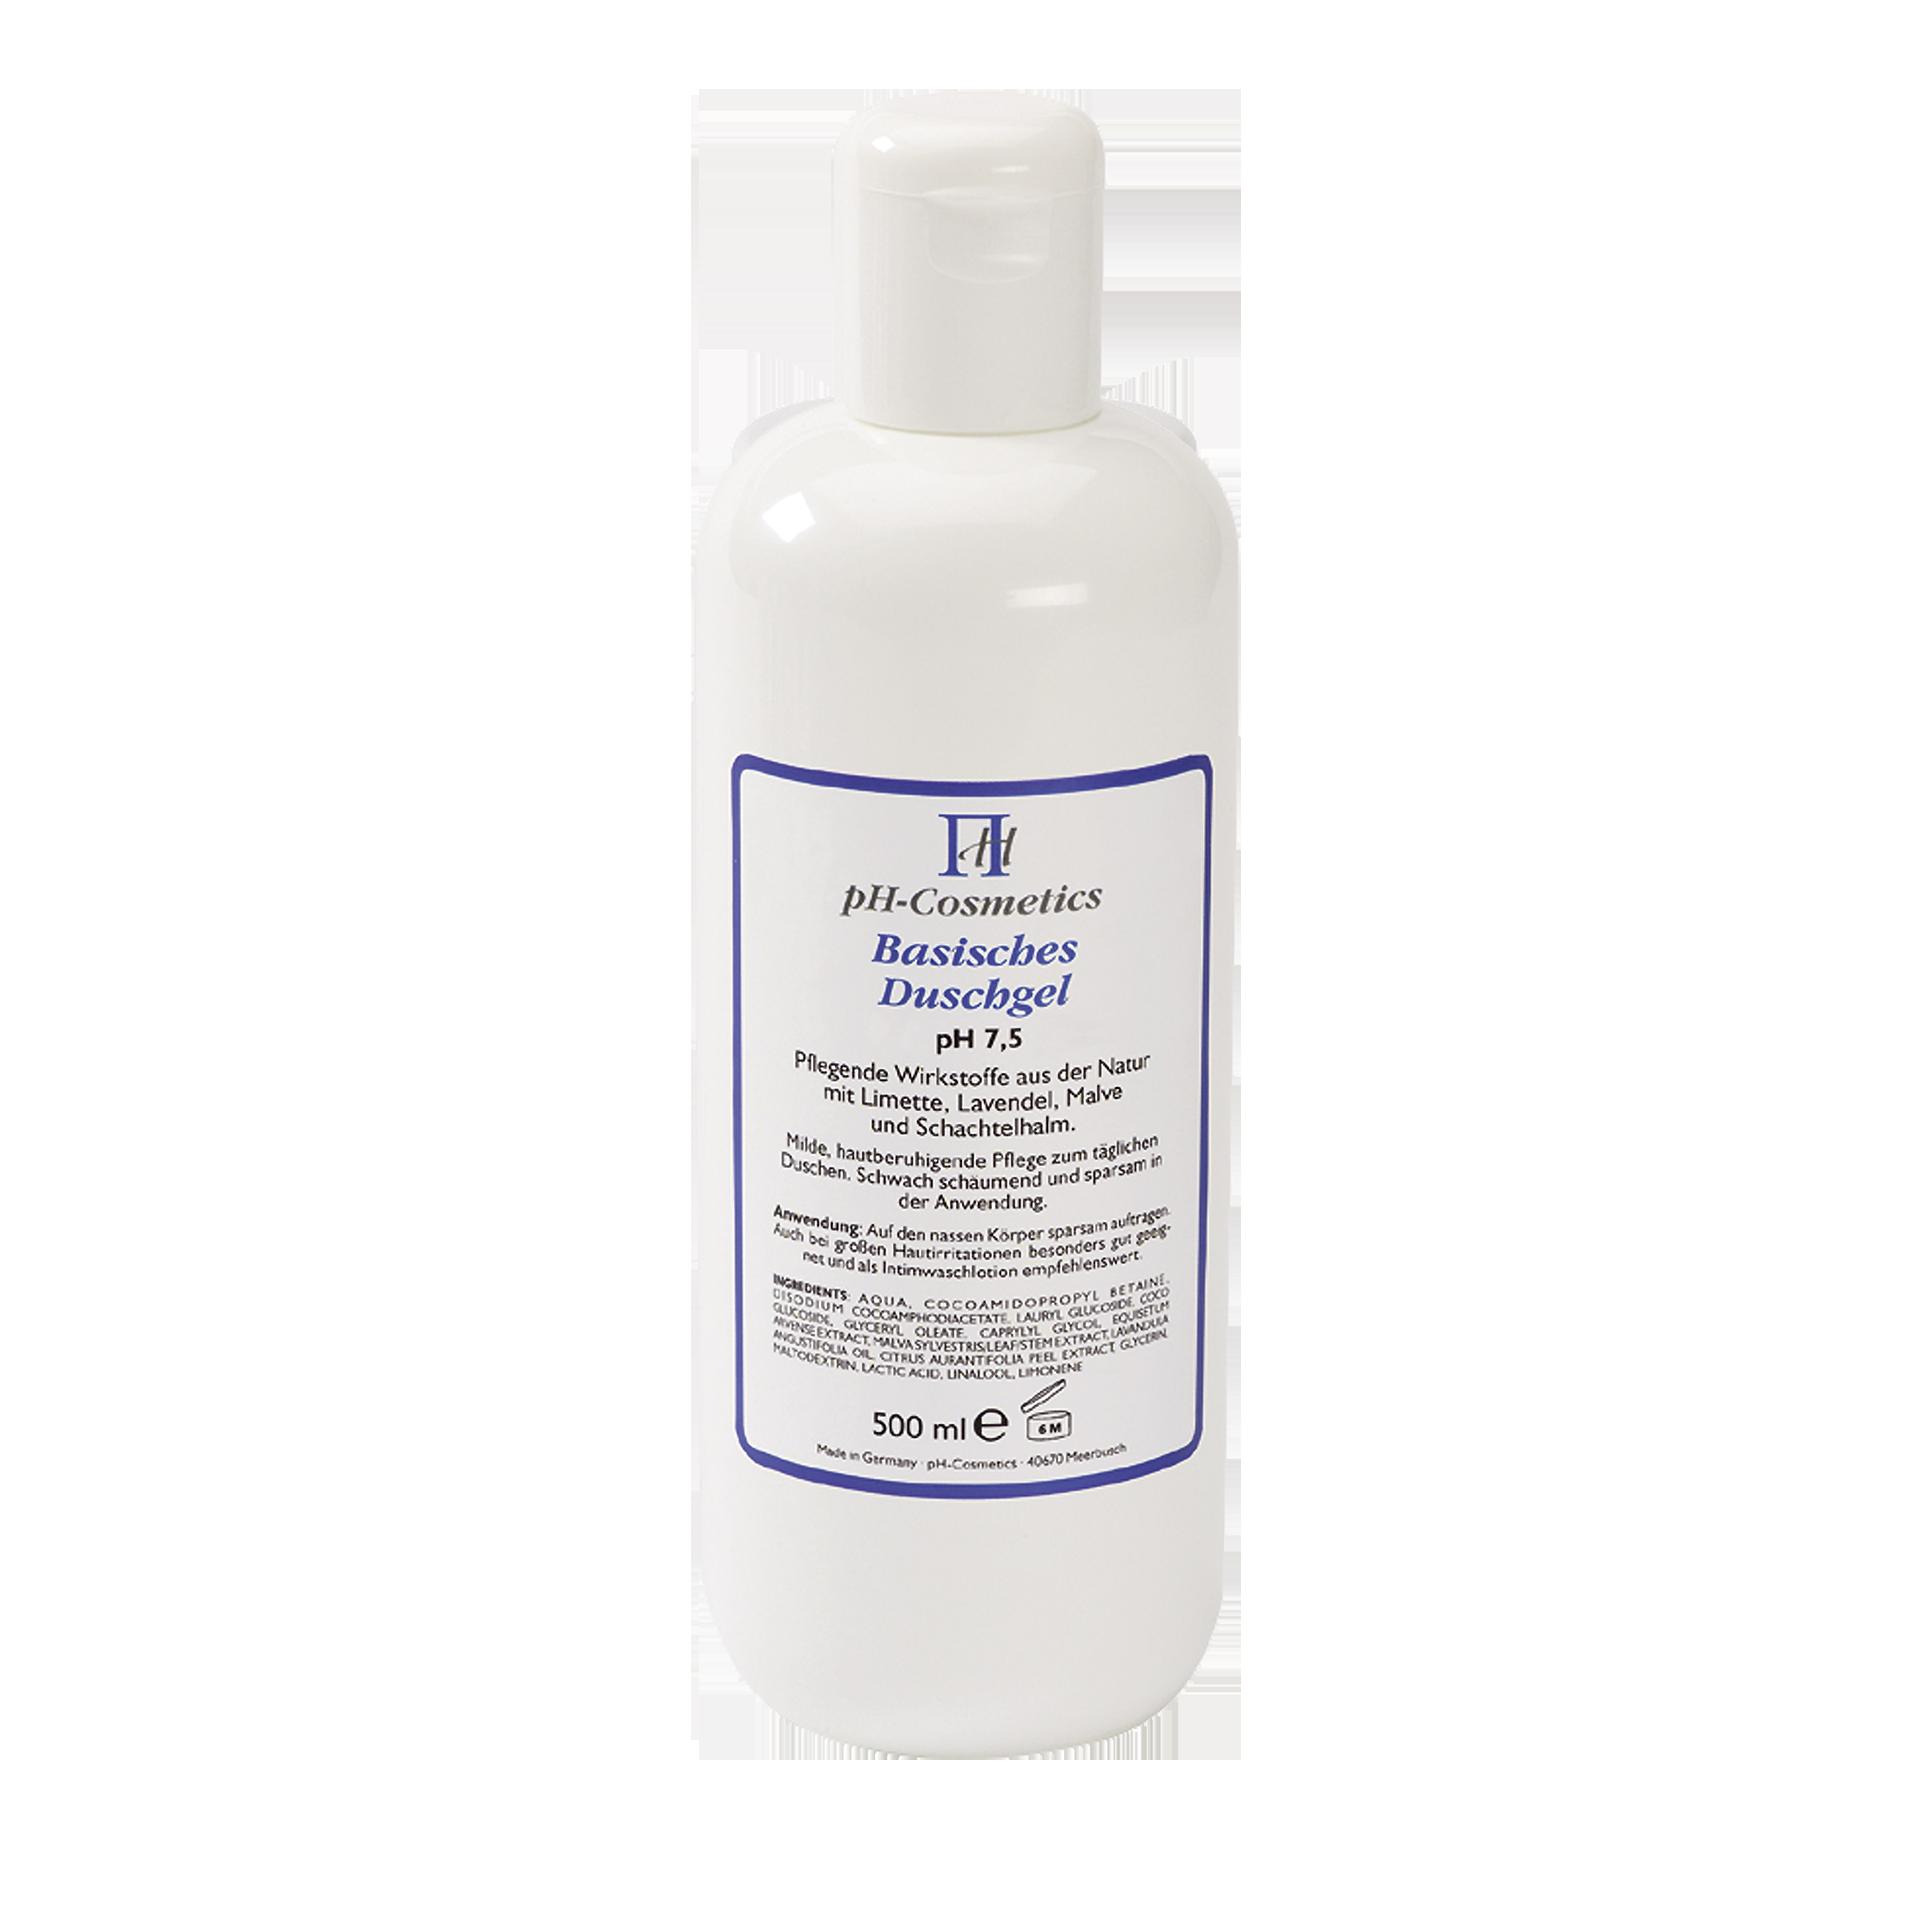 pH-Cosmetics Basisches Duschgel, pH 7.5, 500 ml